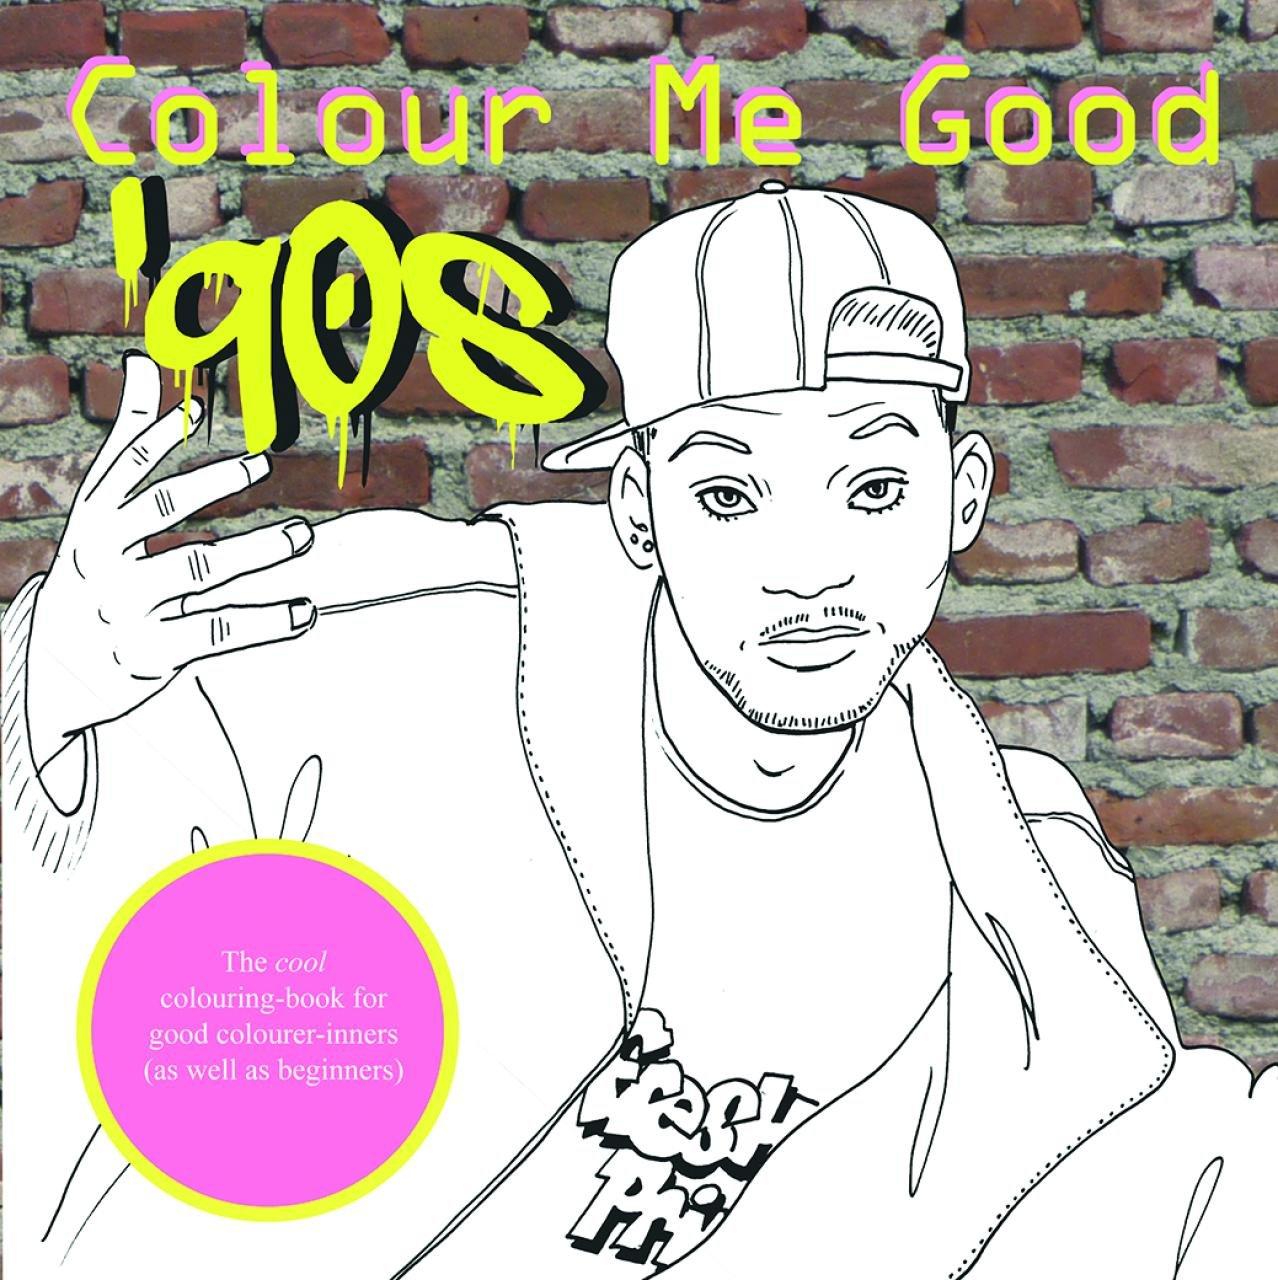 Colour Me Good 90s  Mel Elliott  2015956720870  Amazon Com  Books